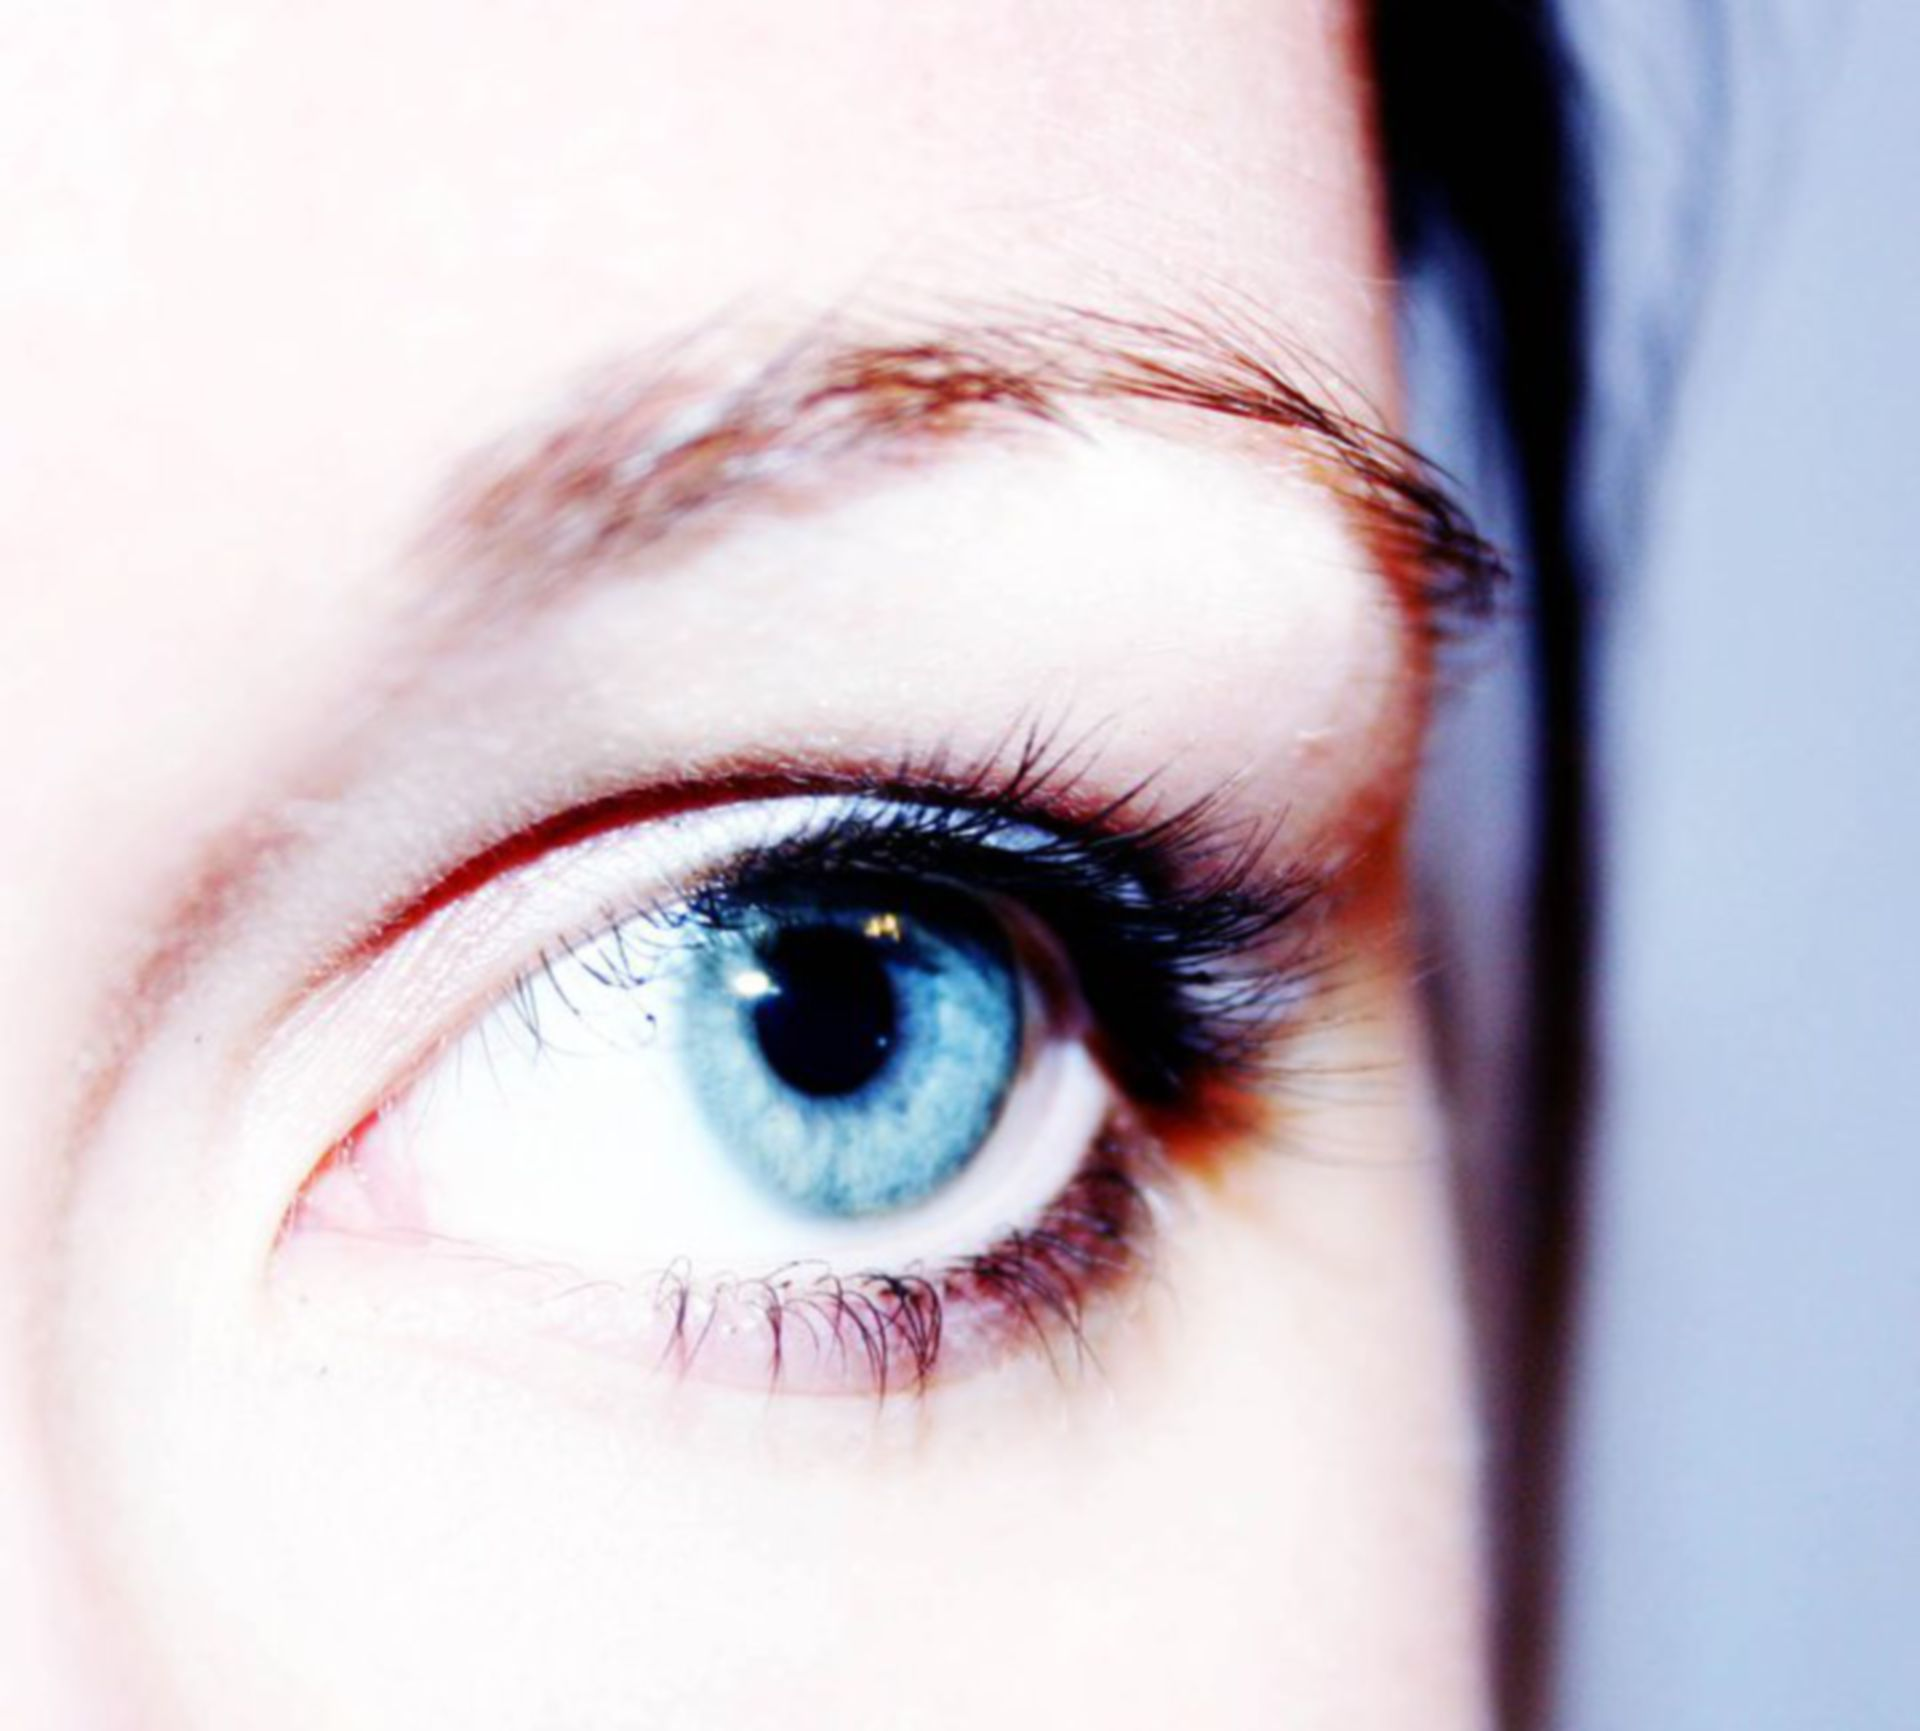 Discerning eye